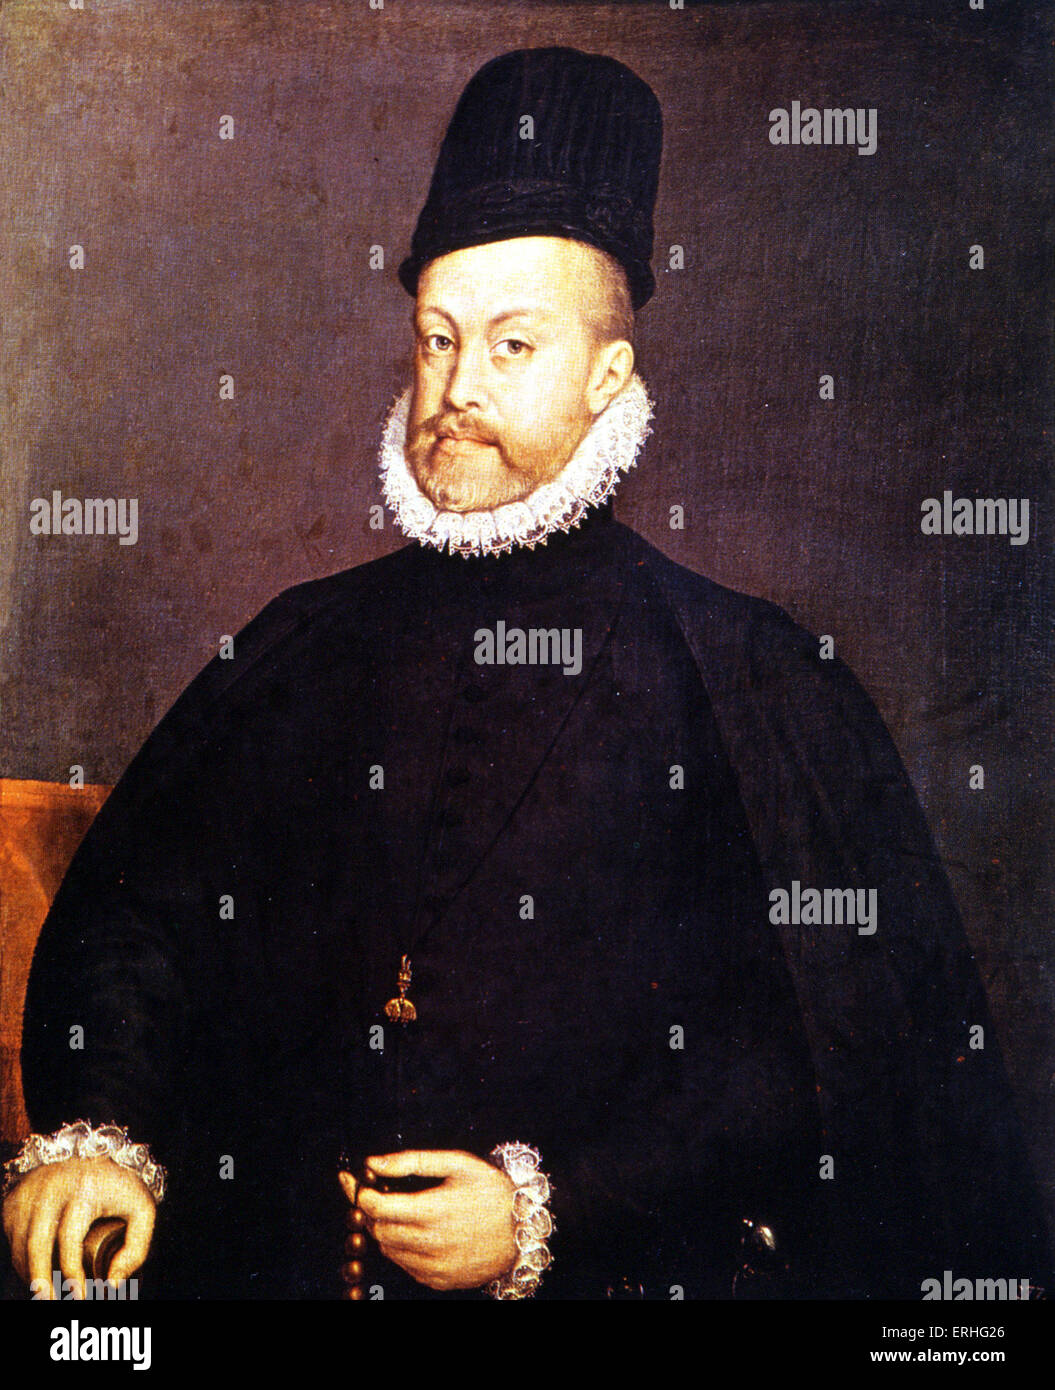 King Philip II (Felipe II) of Spain by Alonso Sanchez Coello, depicted in Verdi 's opera 'Don Carlos'. - Stock Image